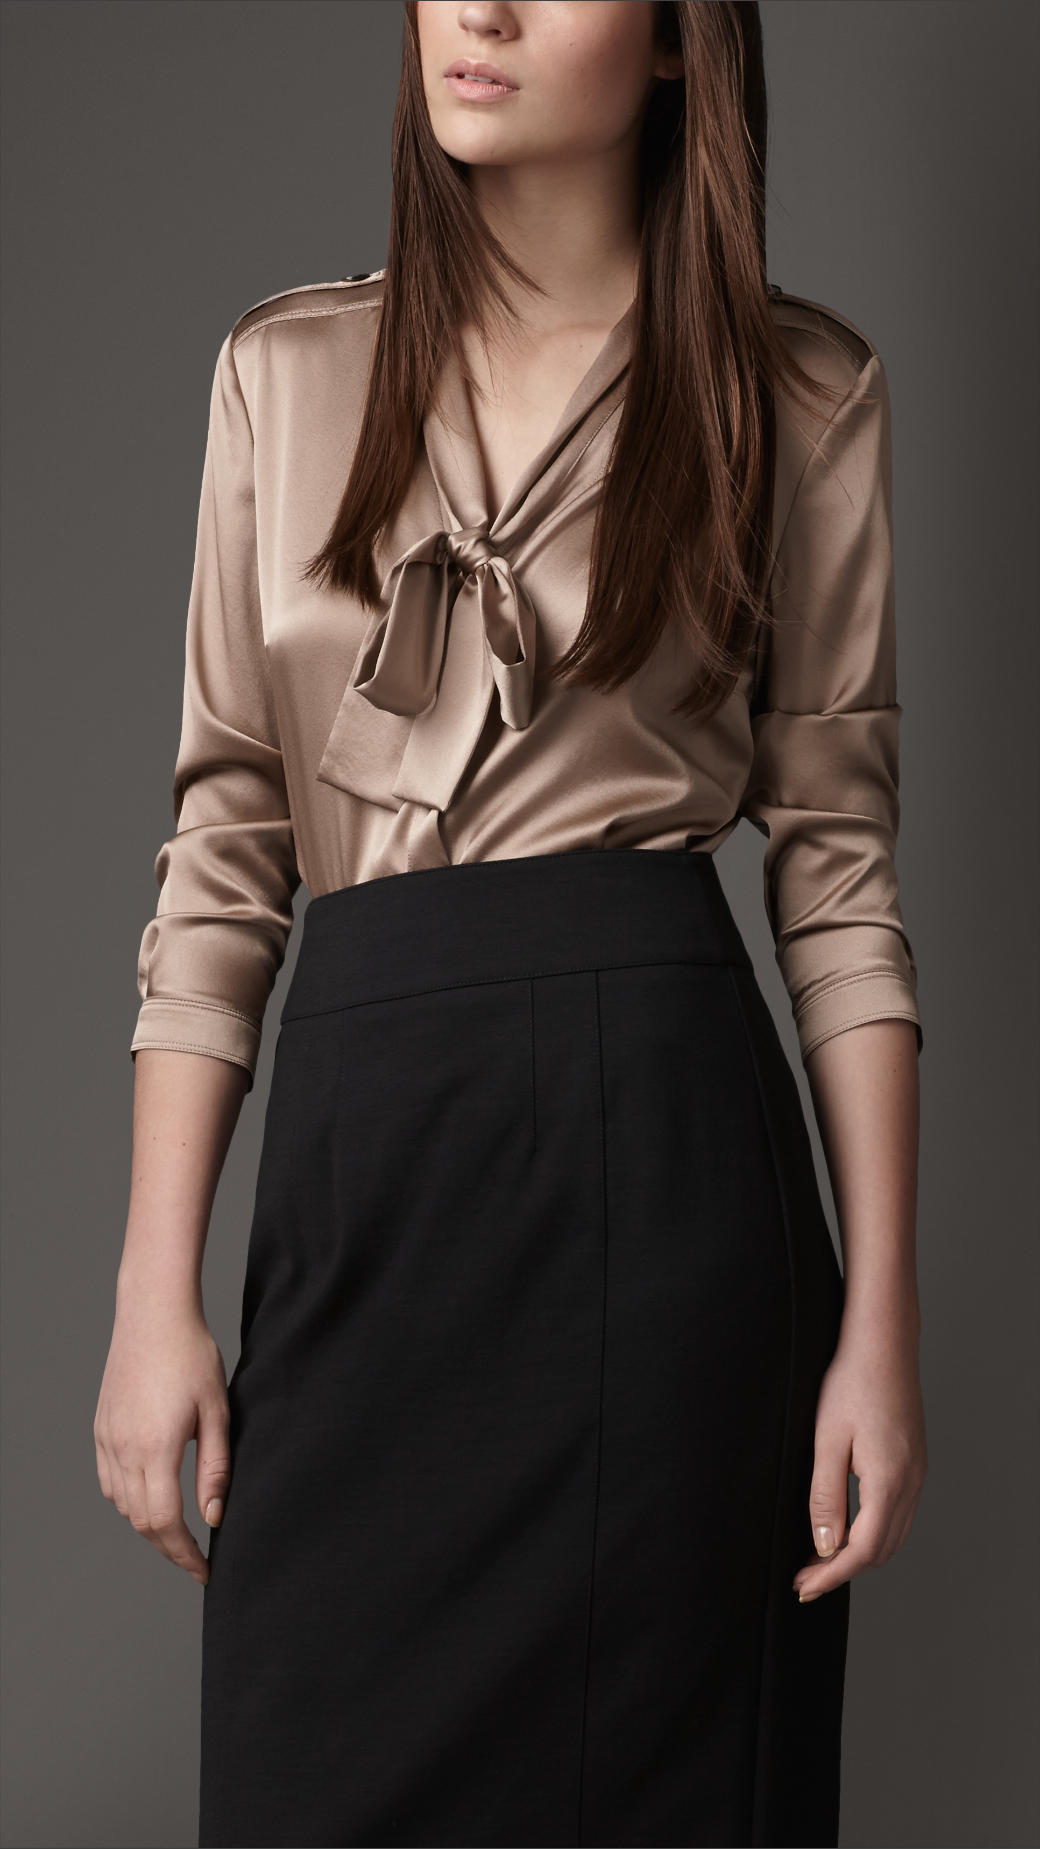 Silk Blouses Women